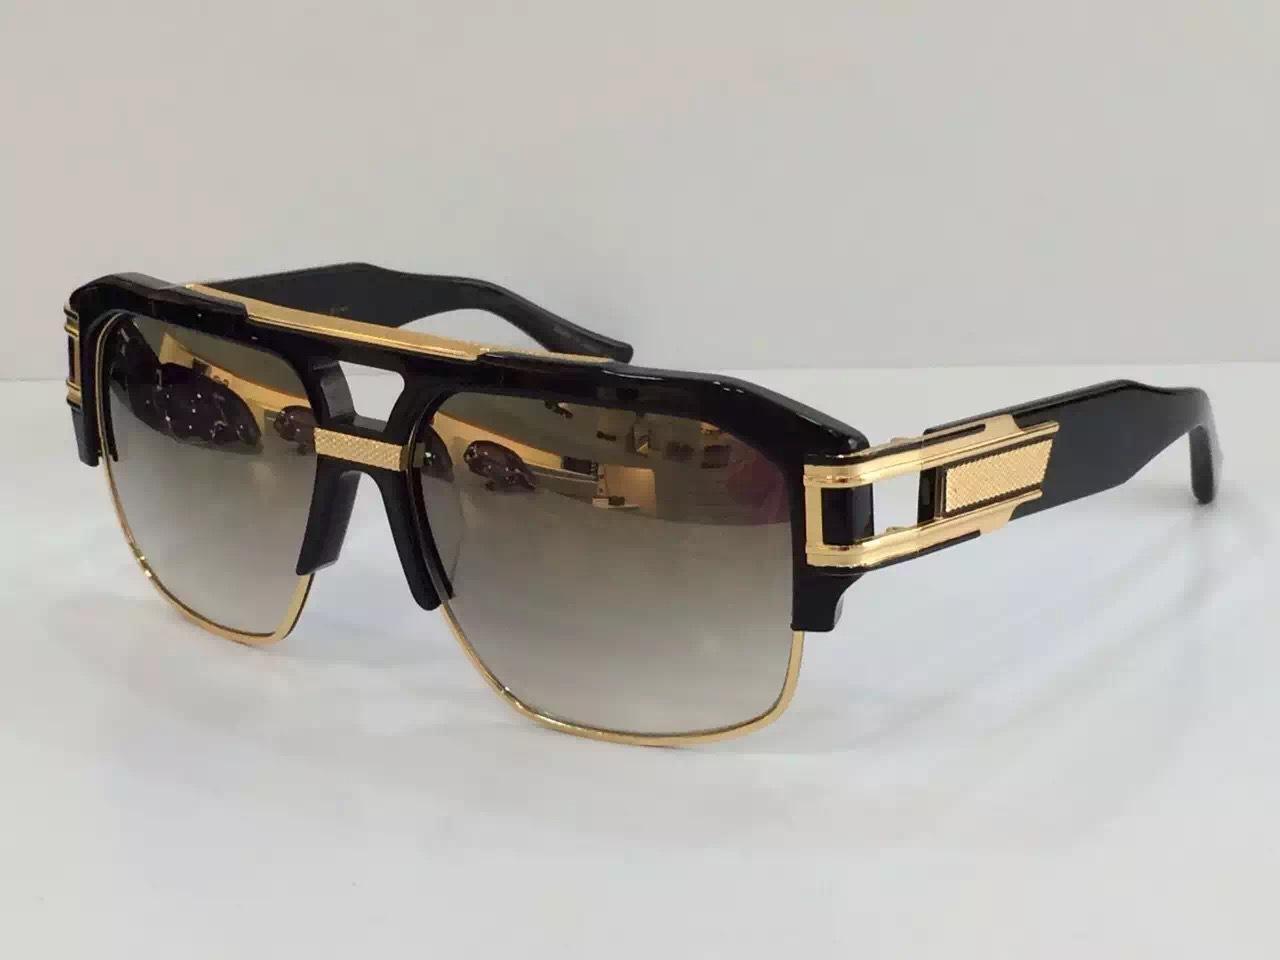 2016 dita sunglasses men dita grandmaster four 2060 eyewear large sunglasses semi metal frame. Black Bedroom Furniture Sets. Home Design Ideas